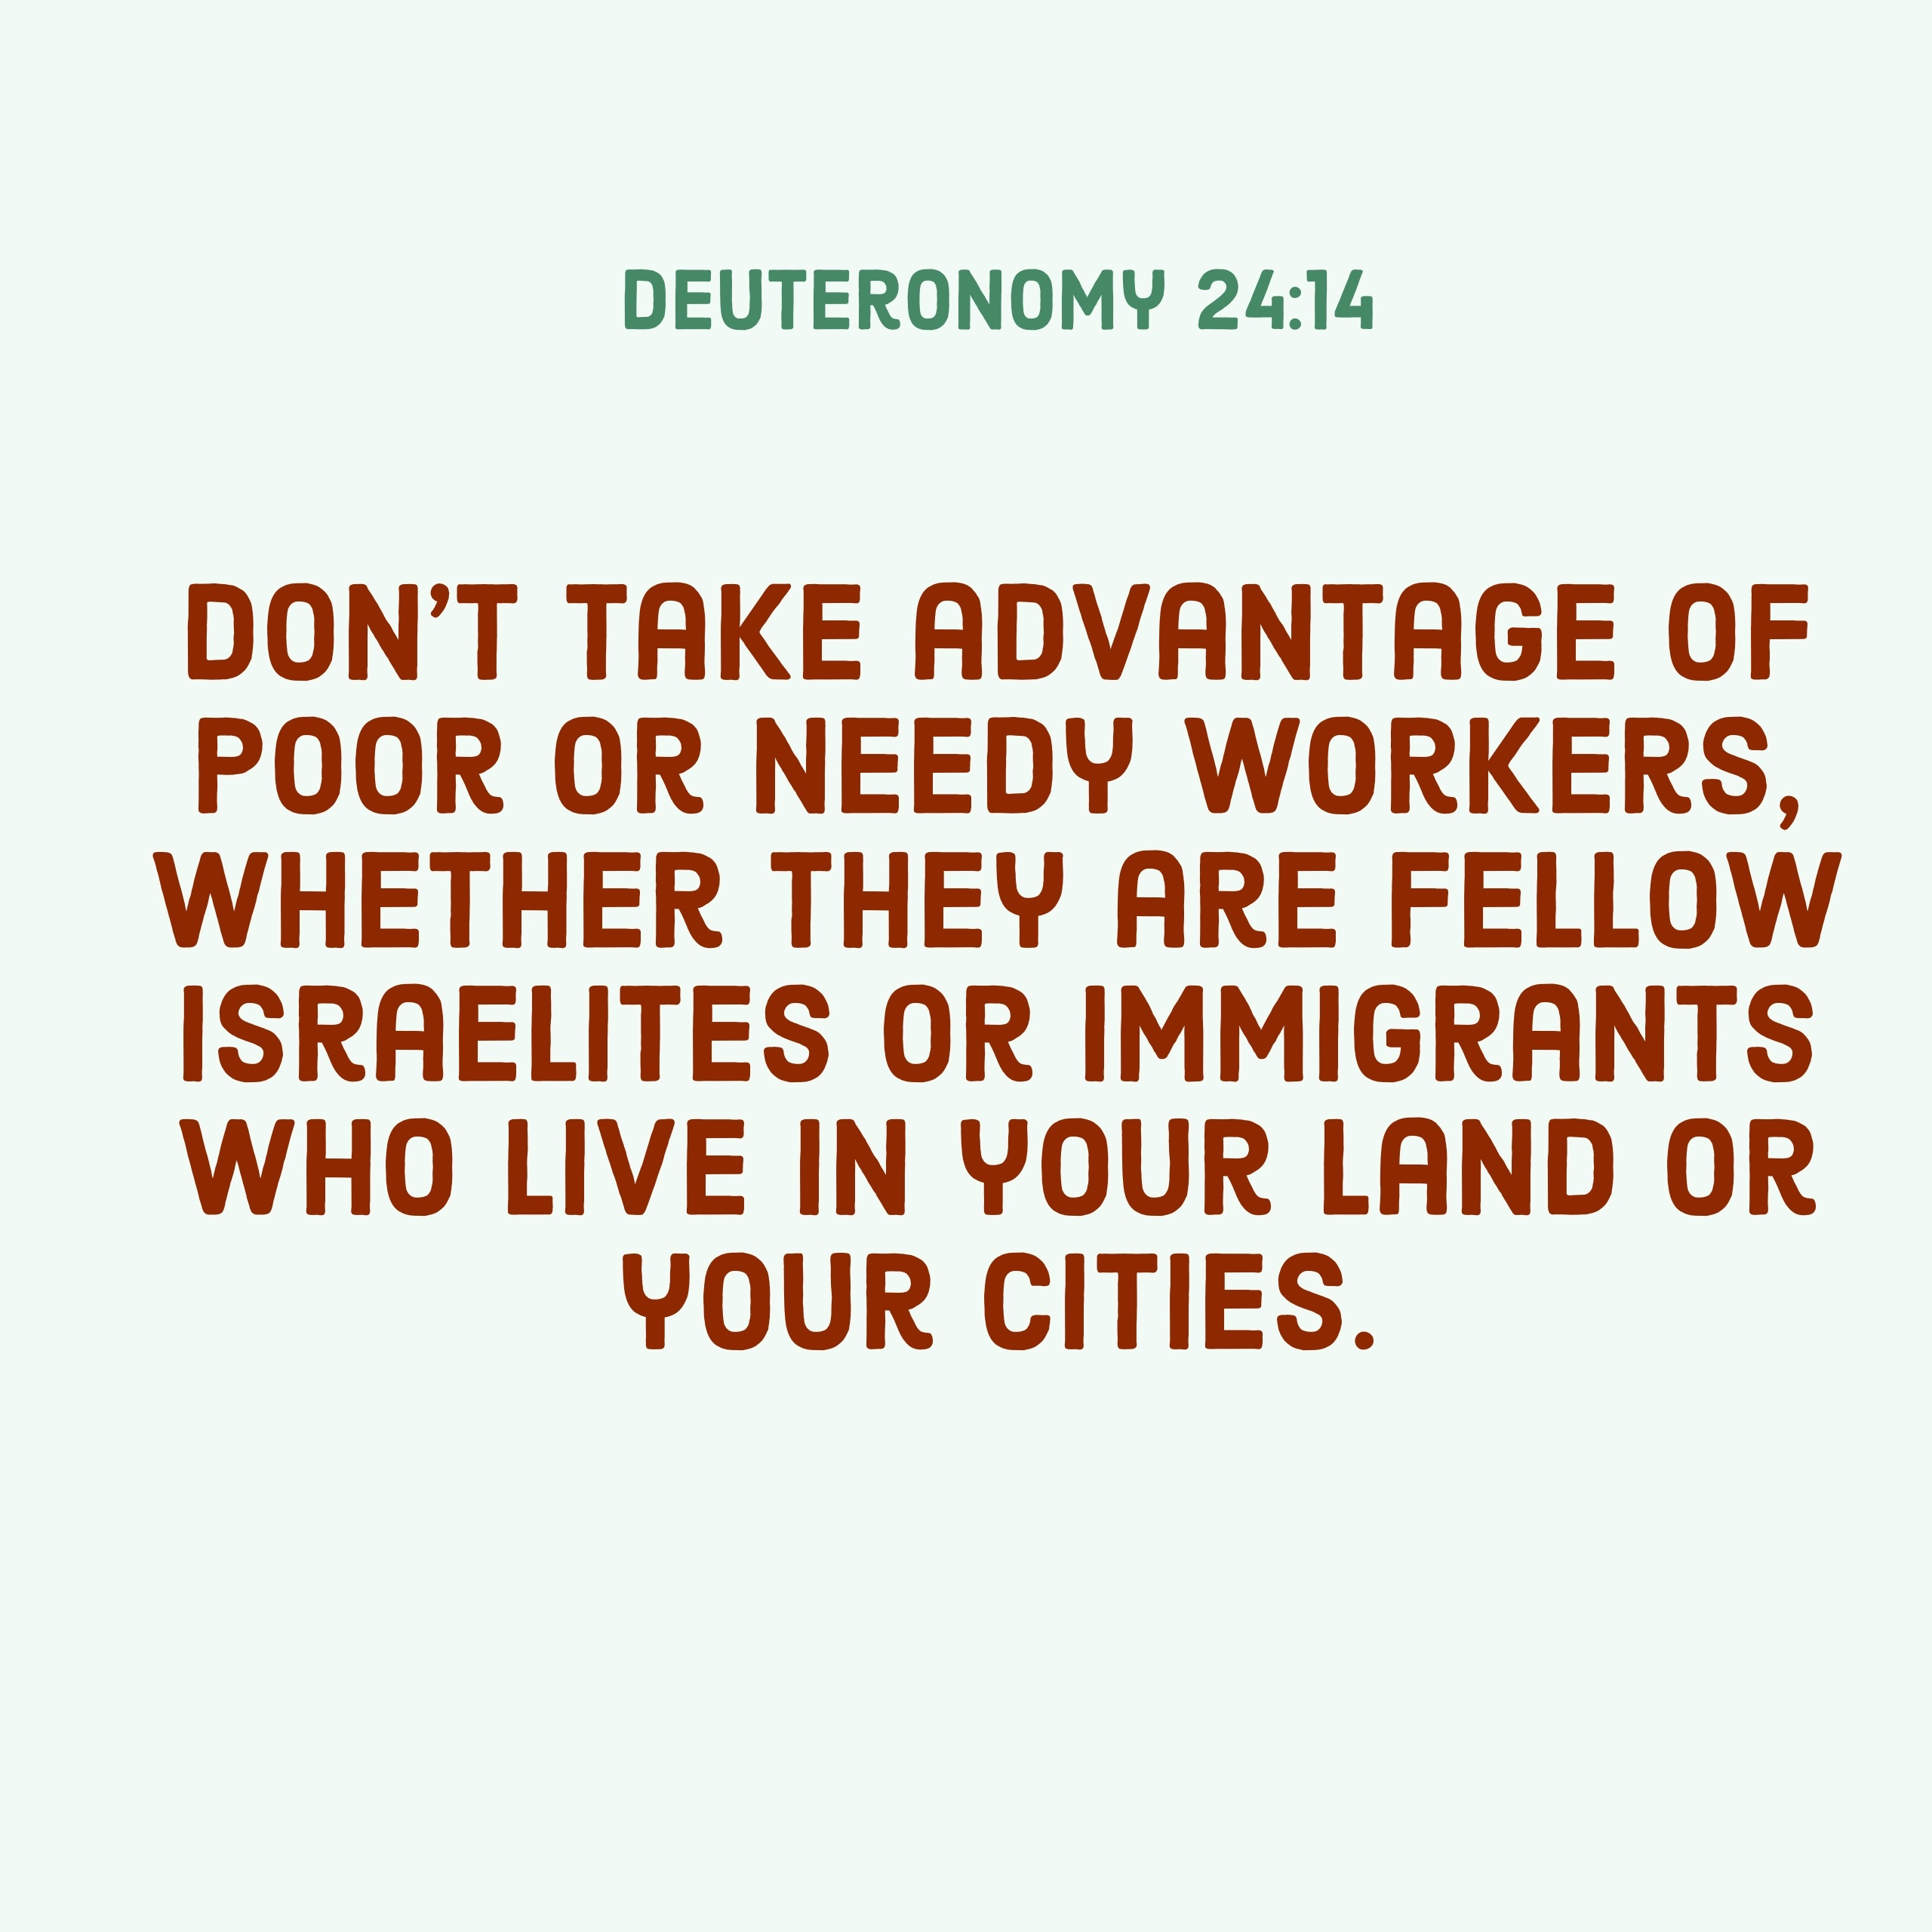 Verse Image for Deuteronomy 24:14 - 1x1